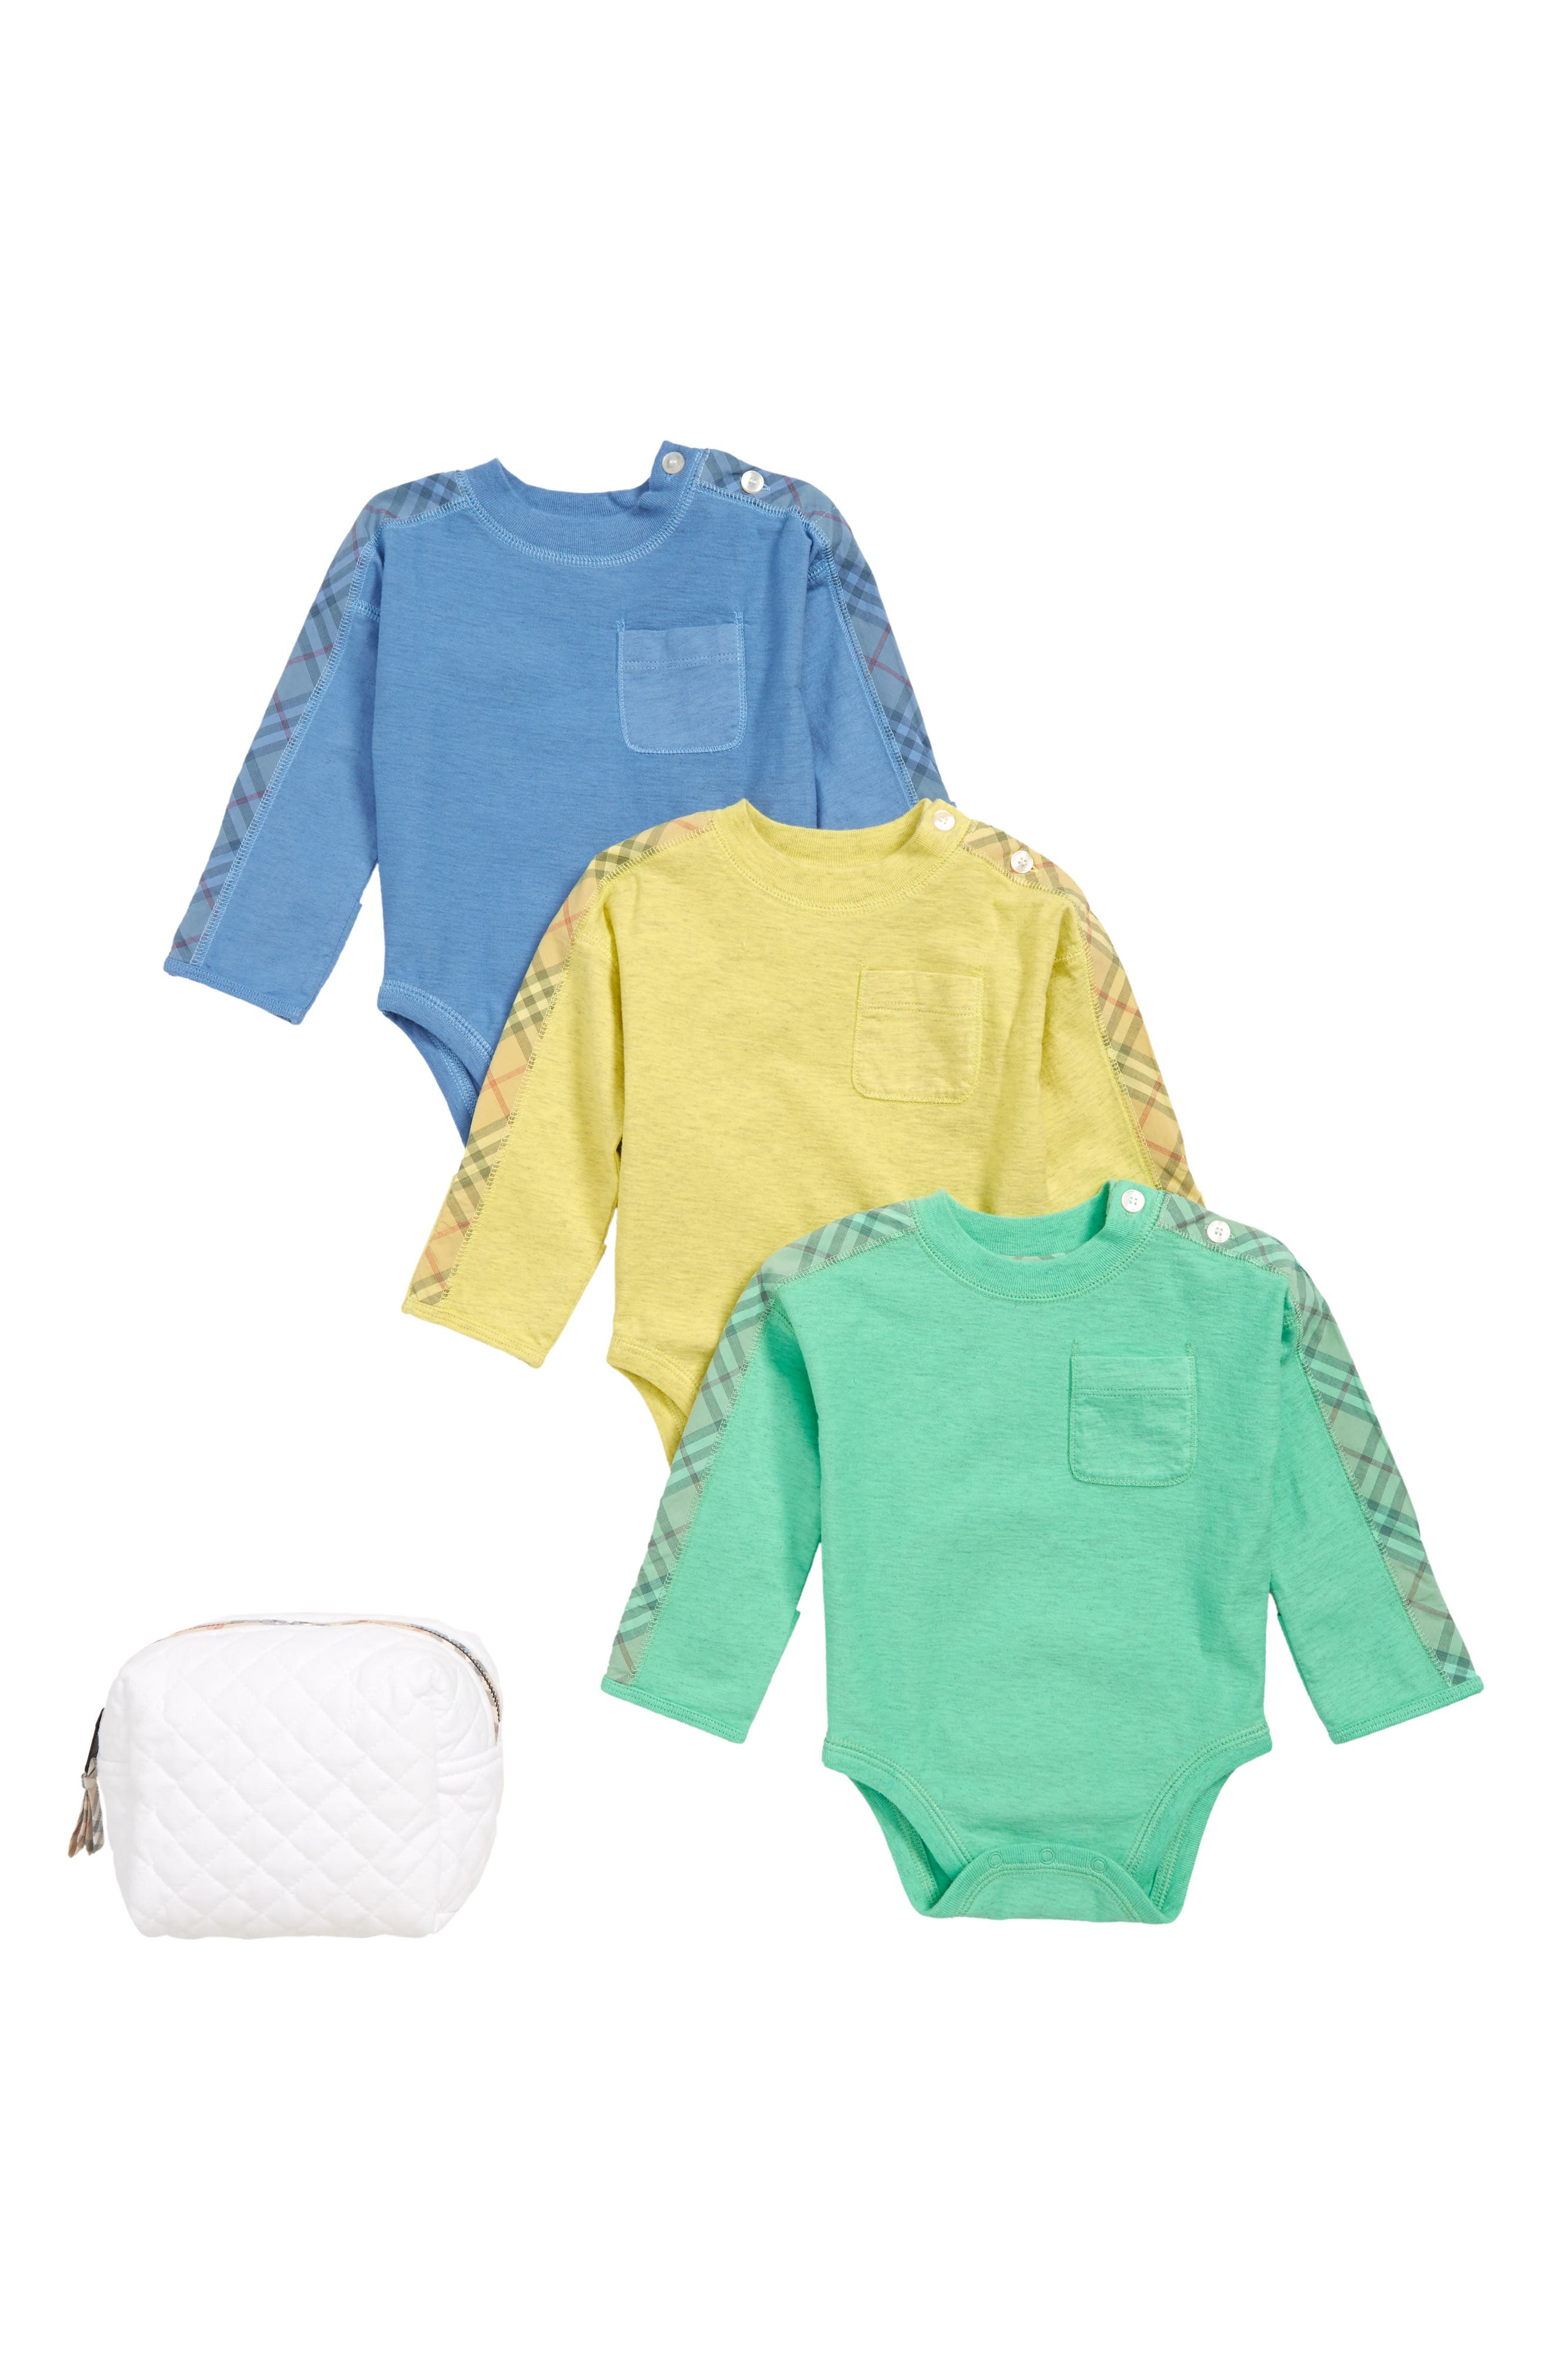 Infant Boys Burberry Alby Bodysuit Set Size 1M  Blue